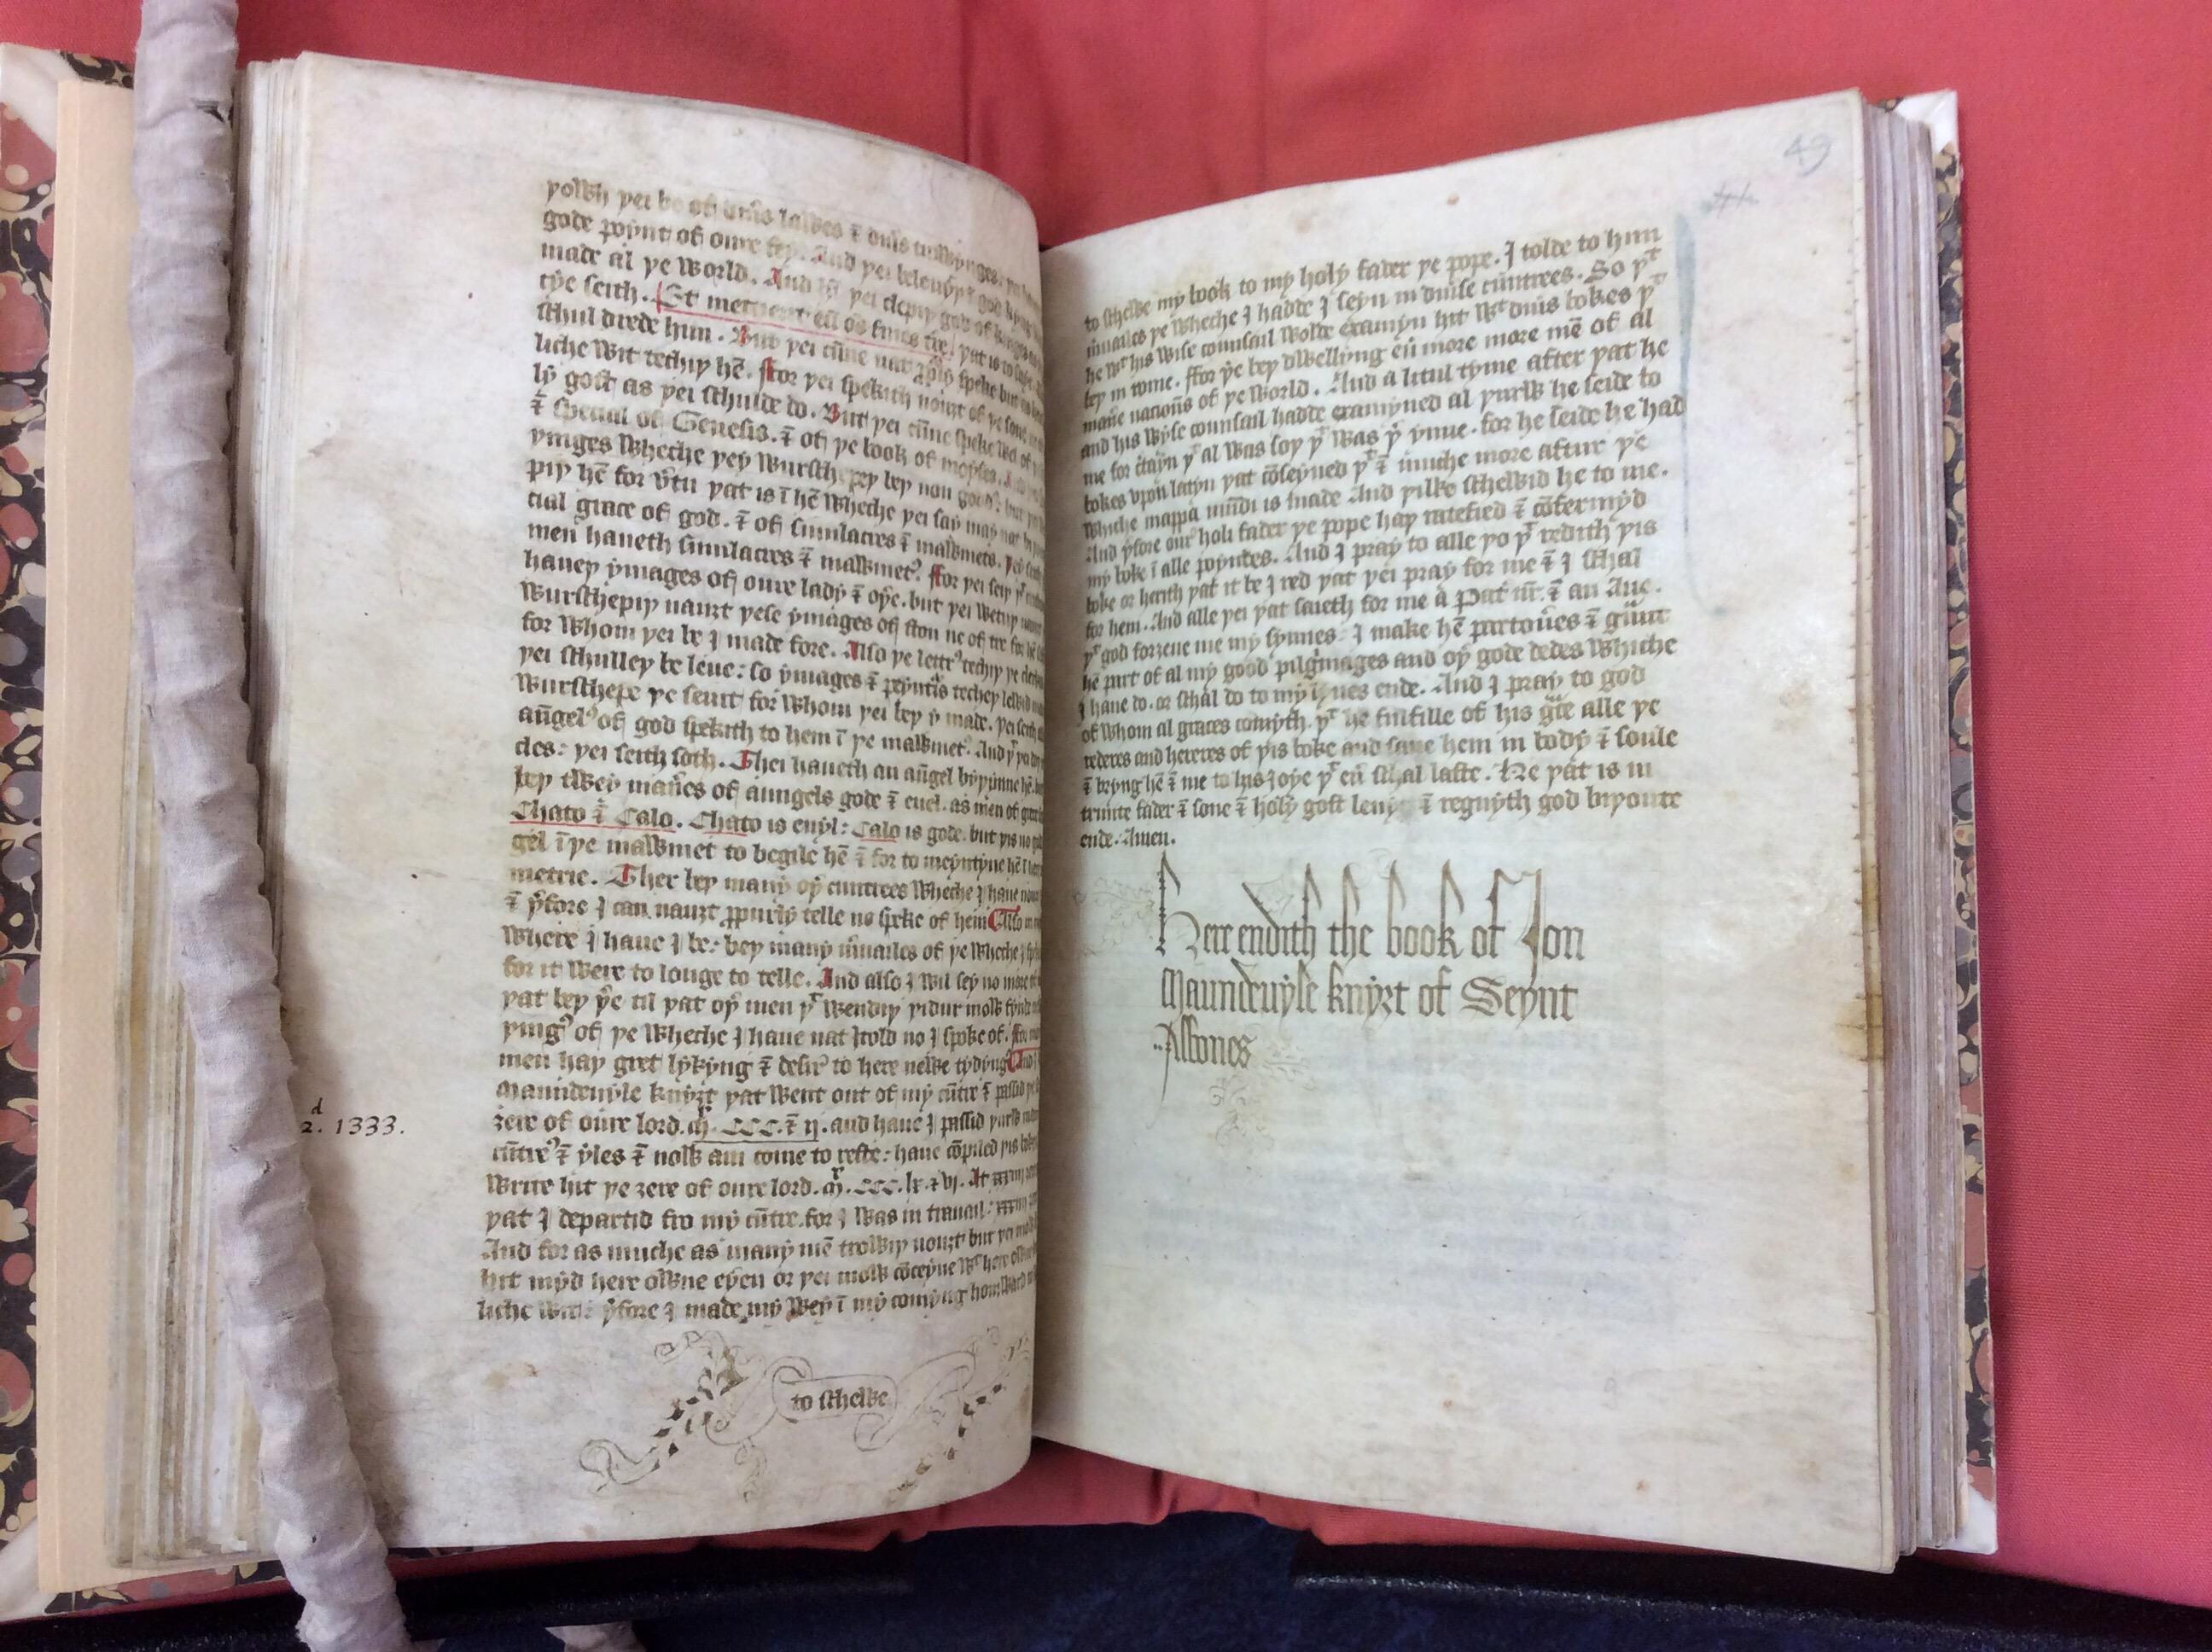 Cambridge University Library, MS Ff. 5. 35, ff. 48v-49r. Copyright Cambridge University Library